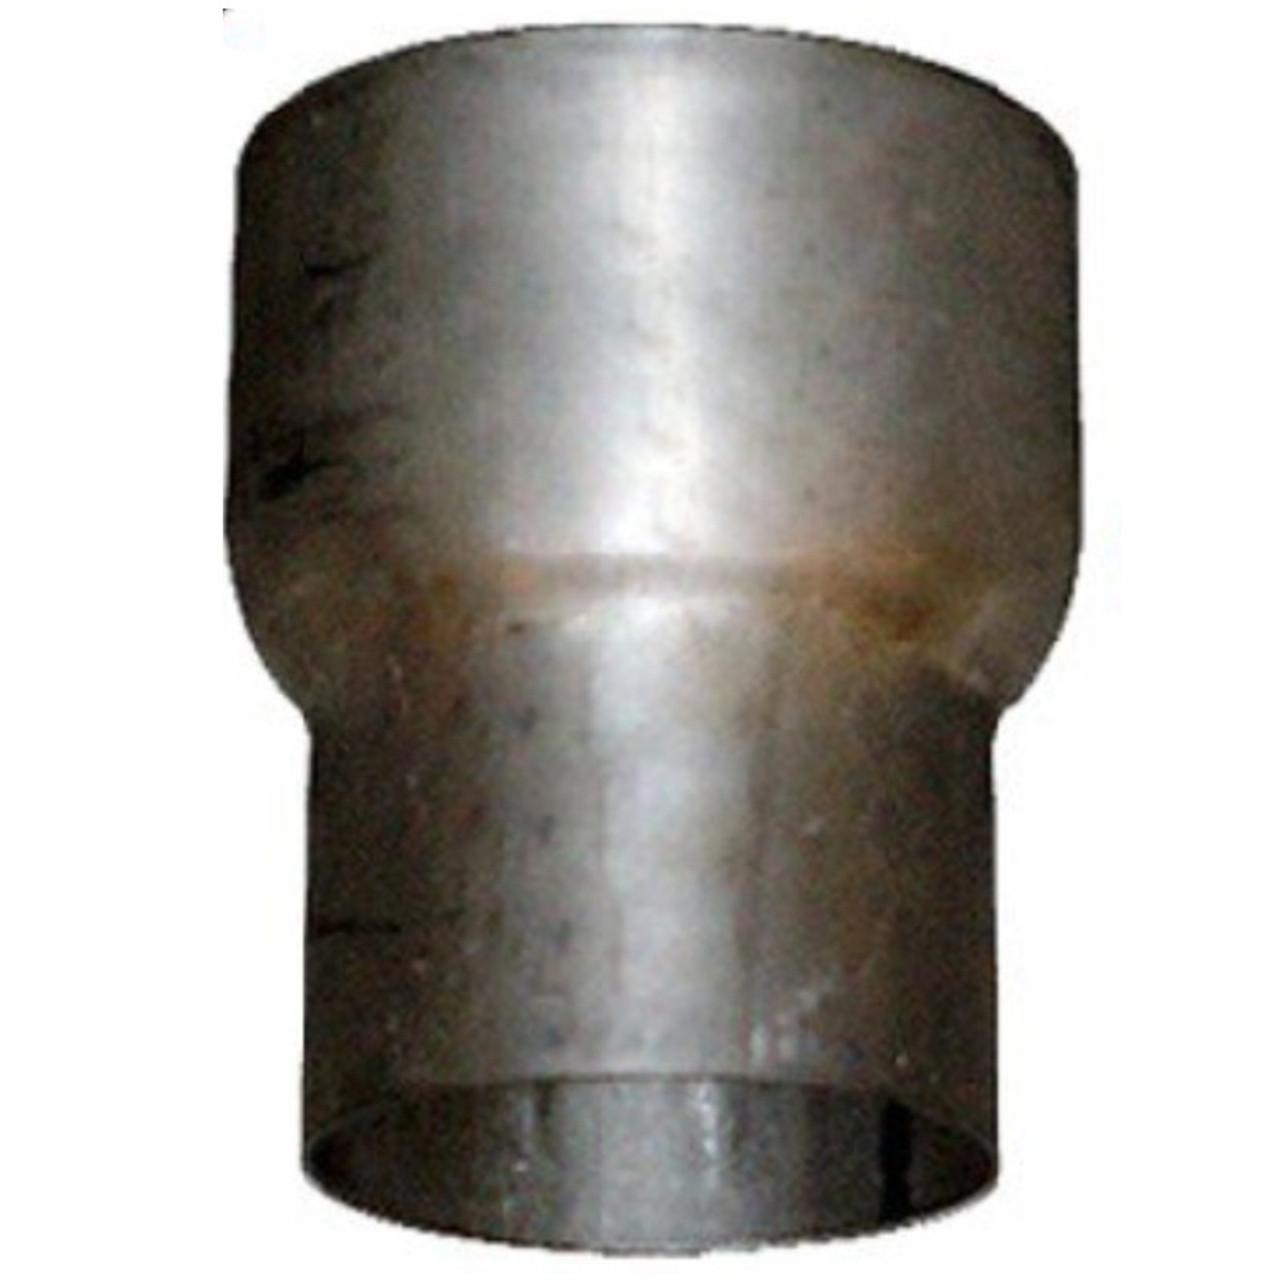 6 od to 5 od exhaust reducer aluminized pipe r6o 5oa